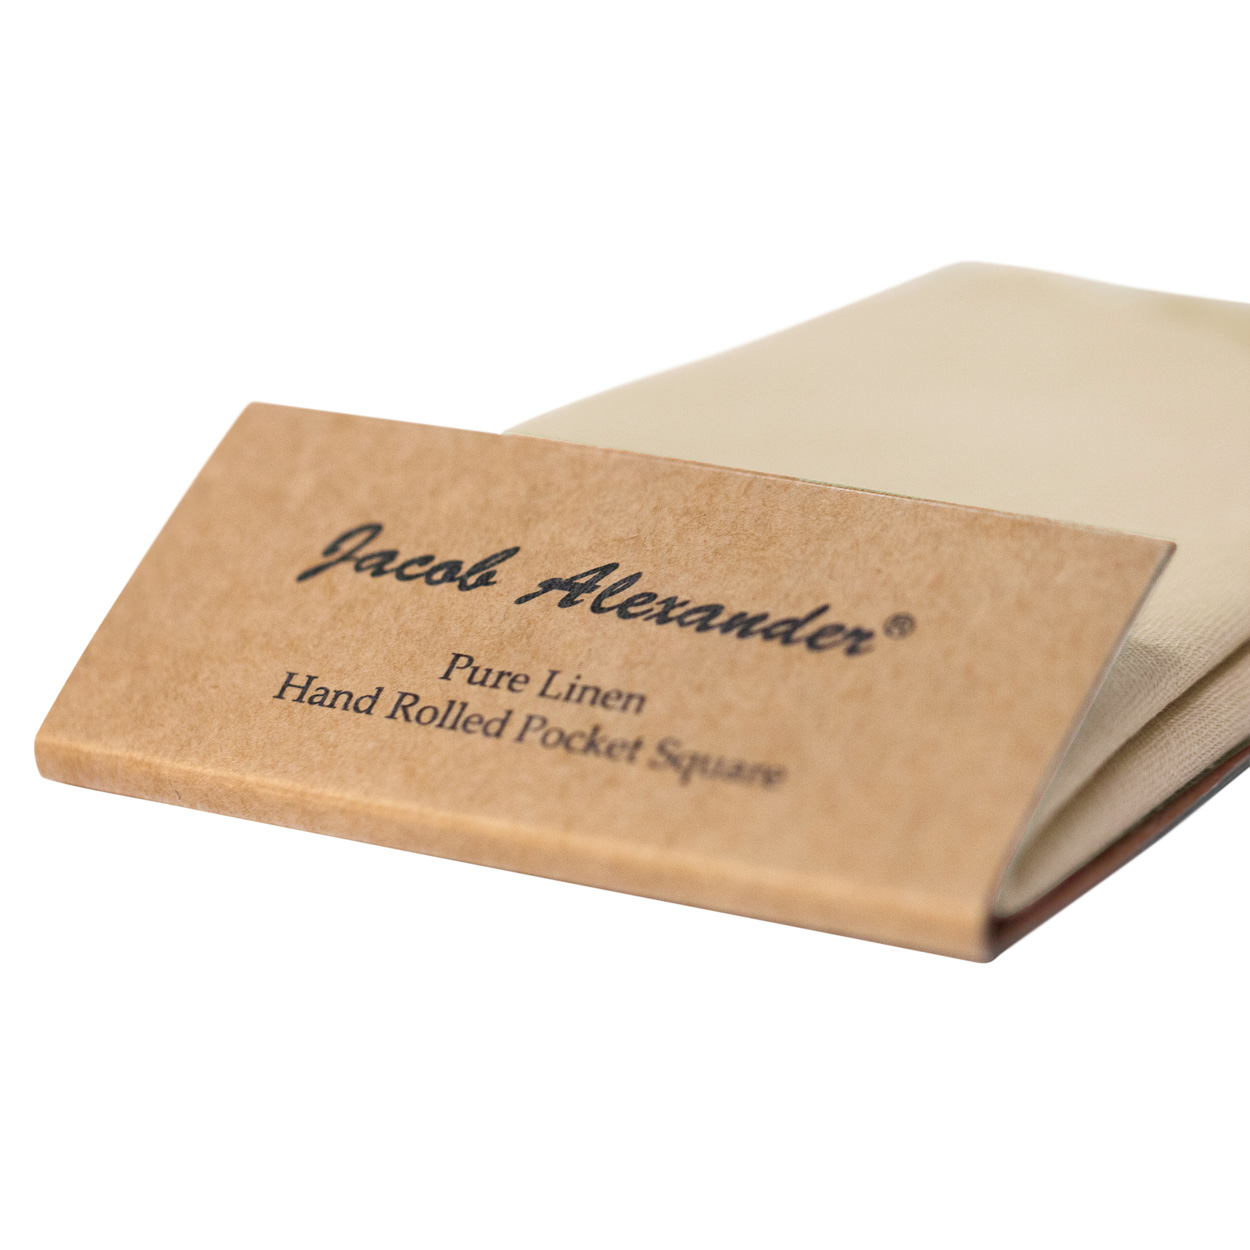 Jacob-Alexander-Linen-Handrolled-15-034-x-15-034-Pocket-Square-Hanky thumbnail 36